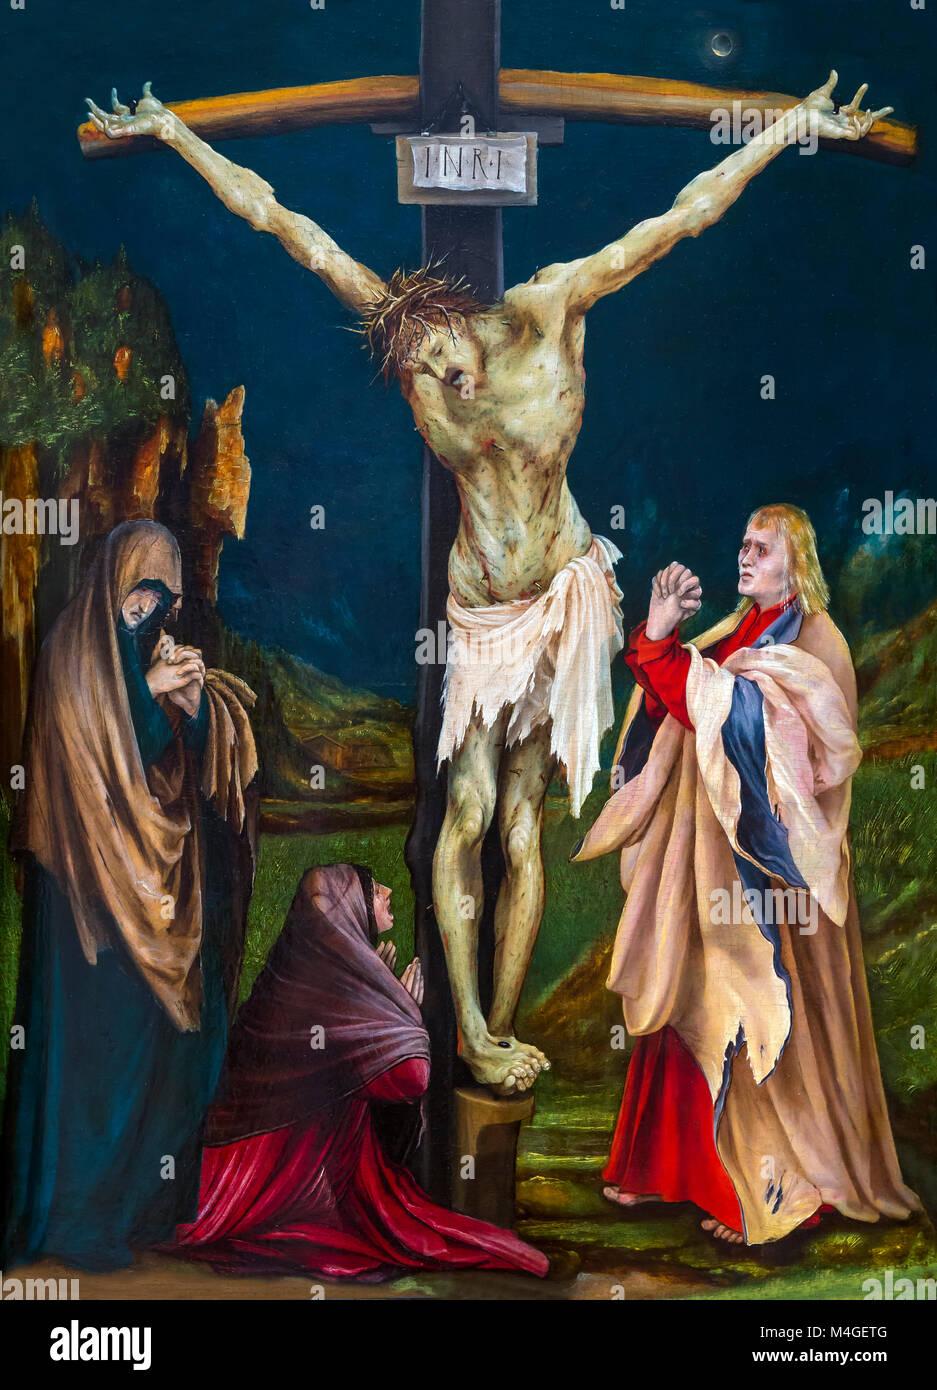 The Small Crucifixion, Matthias Grunewald, circa 1510-1520, National Gallery of Art, Washington DC, USA, North America - Stock Image